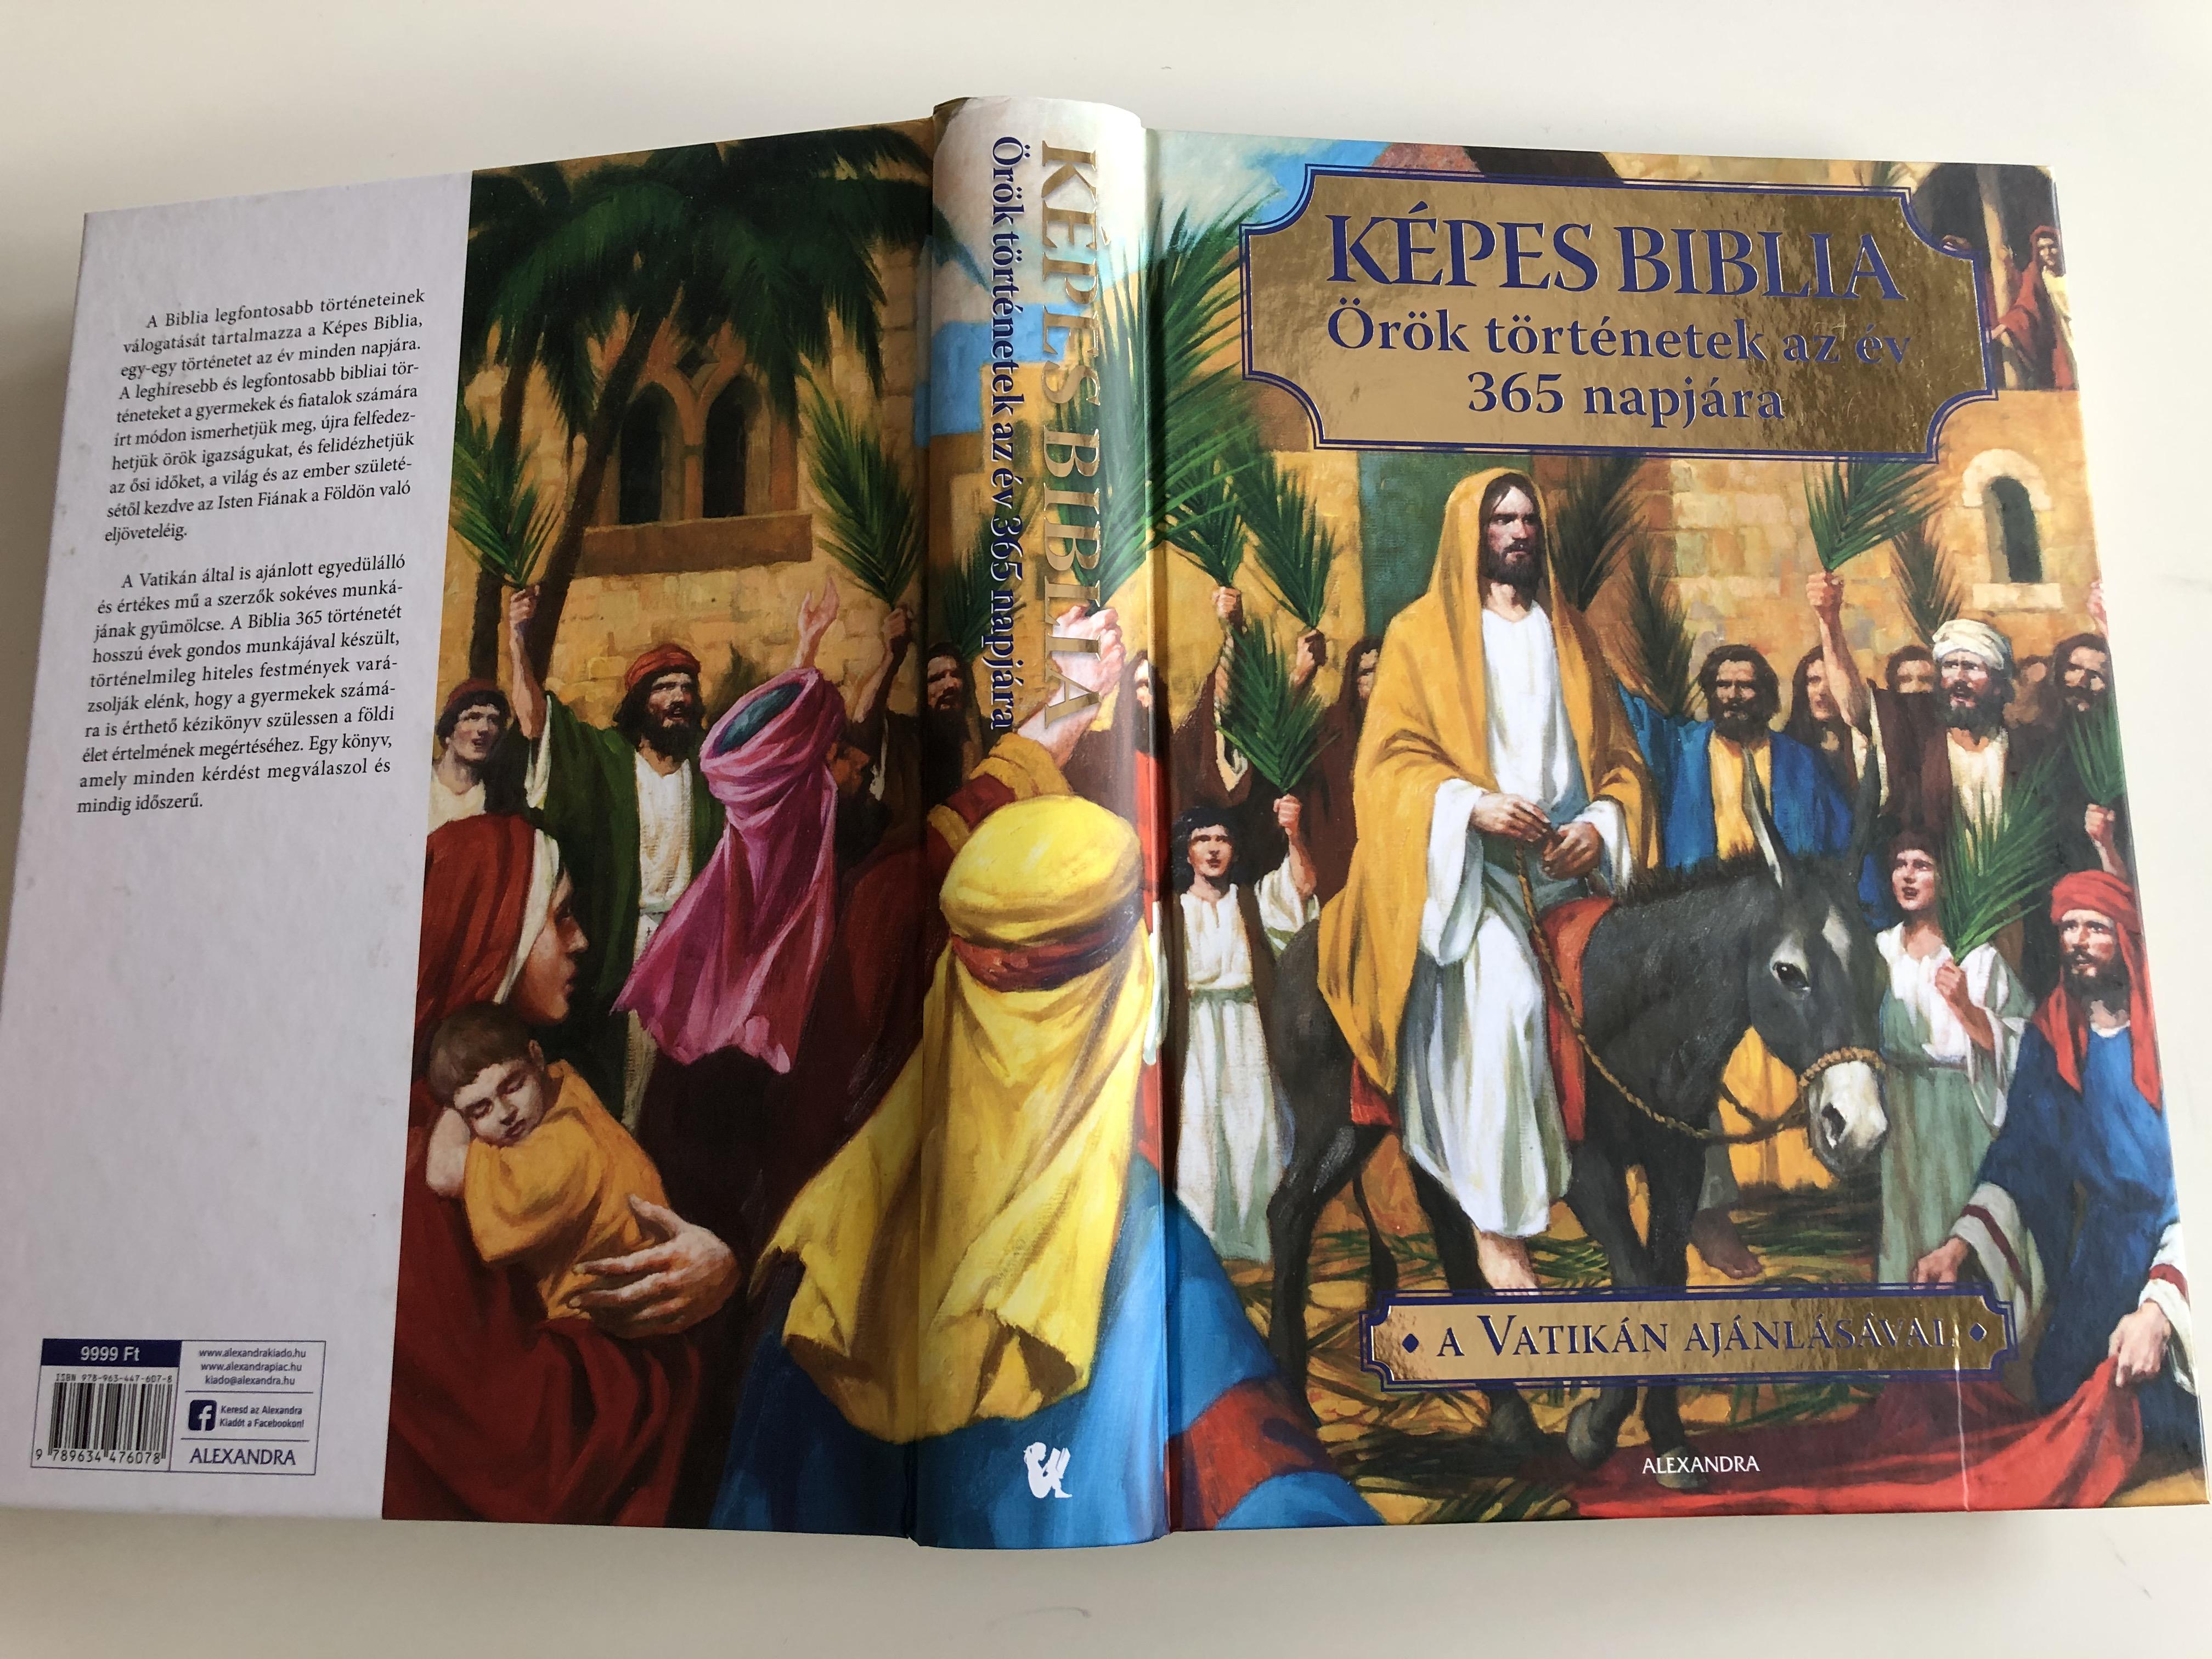 k-pes-biblia-r-k-t-rt-netek-az-s-365-napj-ra-hungarian-language-children-s-bible-stories-for-365-days-25.jpg